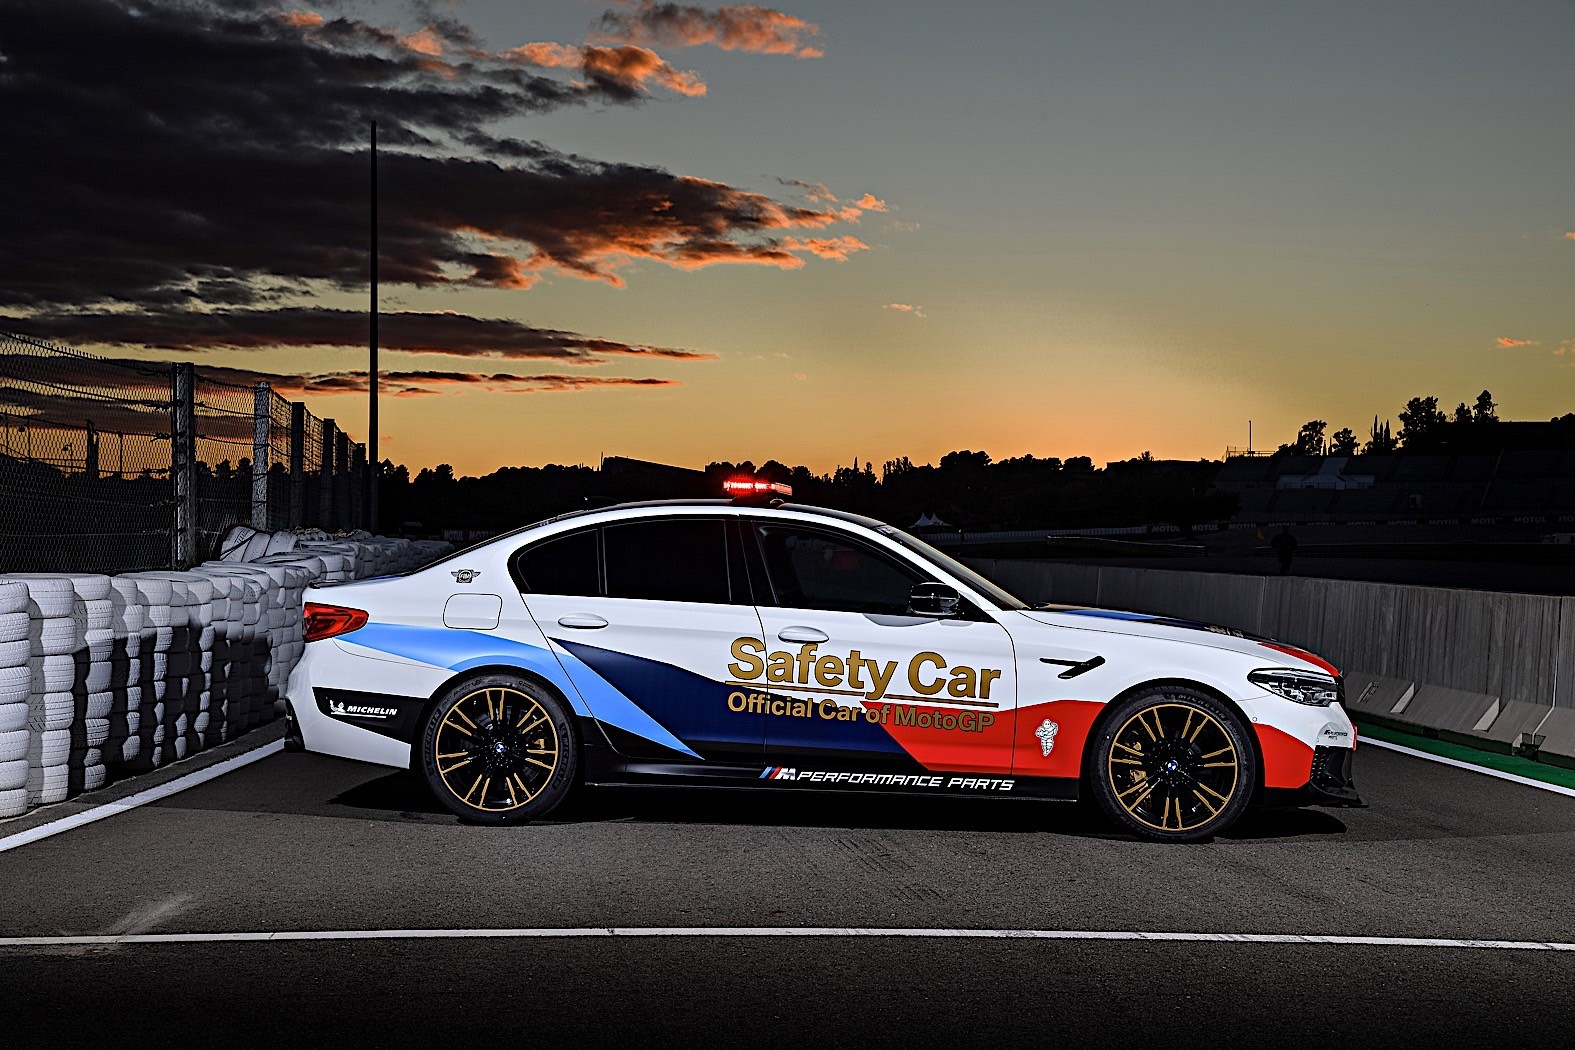 2018 BMW M5 MotoGP Safety Car Gets Ready for Season Start - autoevolution